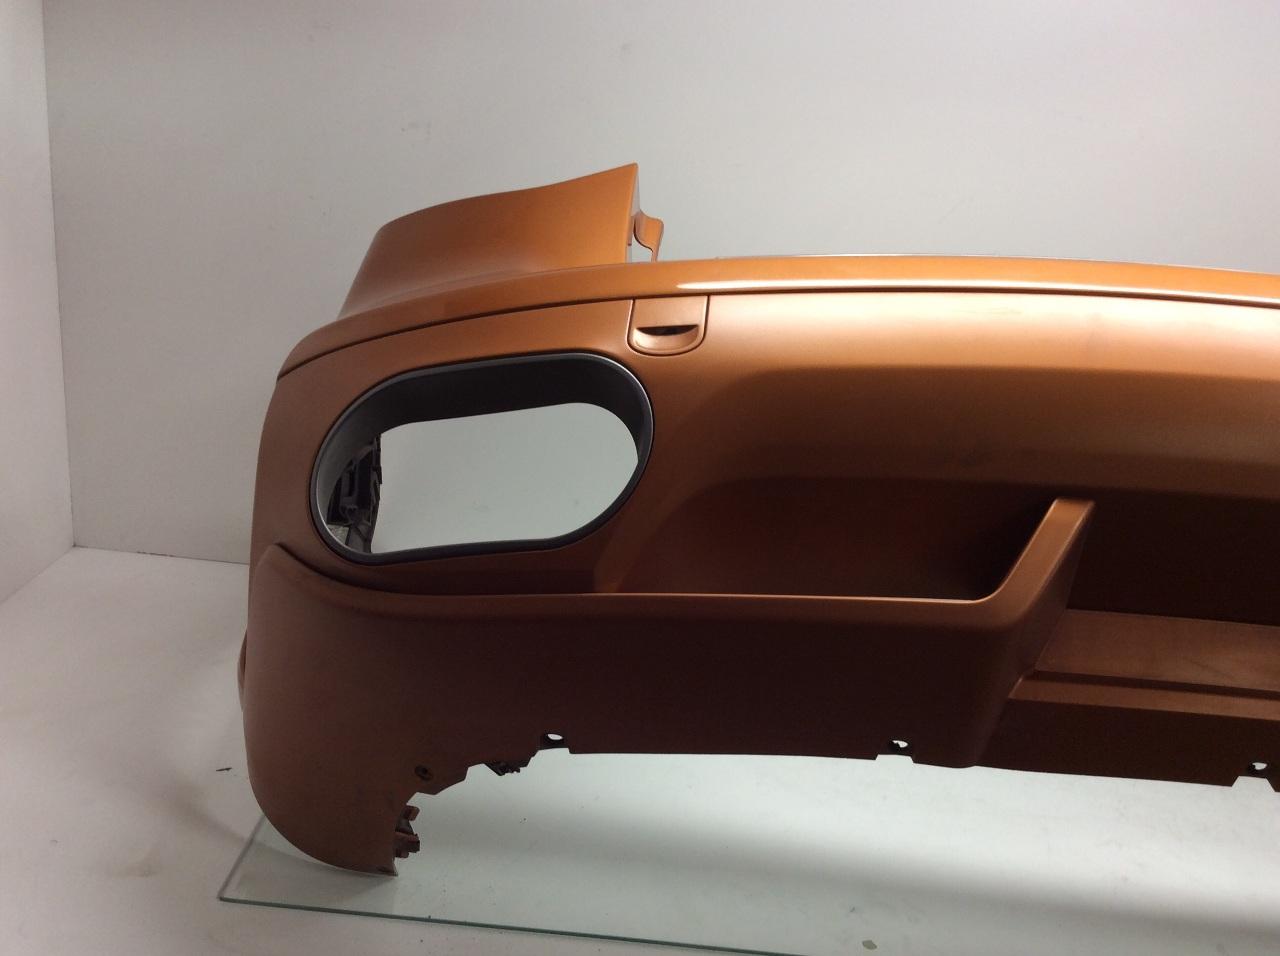 2008 2009 2010 porsche cayenne gts rear bumper complete